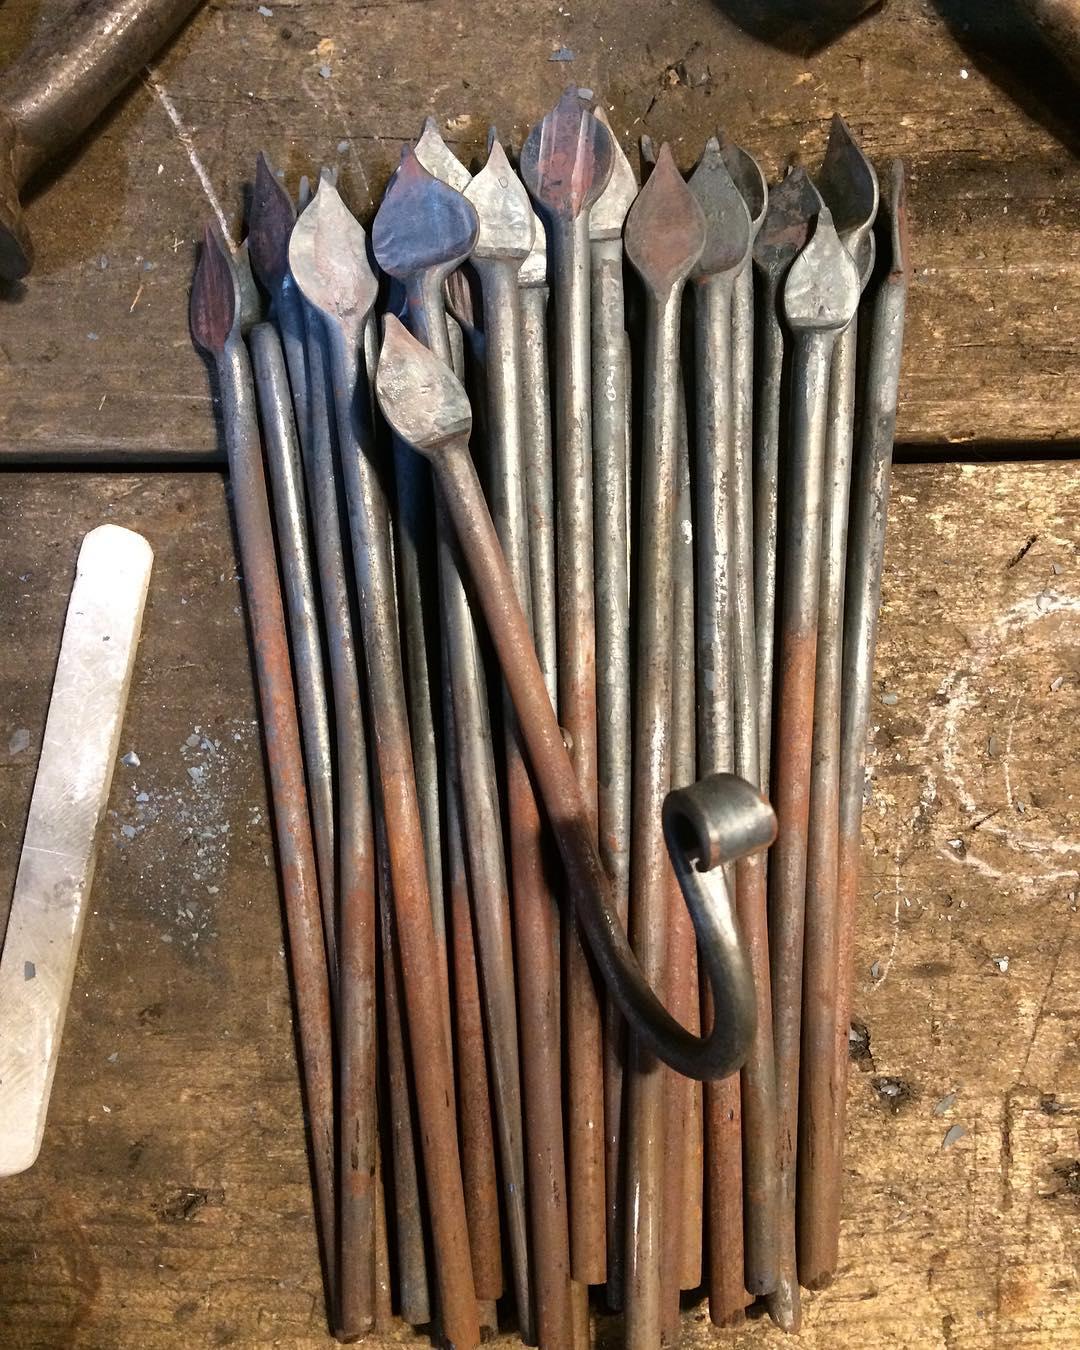 A ctrl+C and ctrl+V kind of day. #blacksmith #handmade #forged #hook